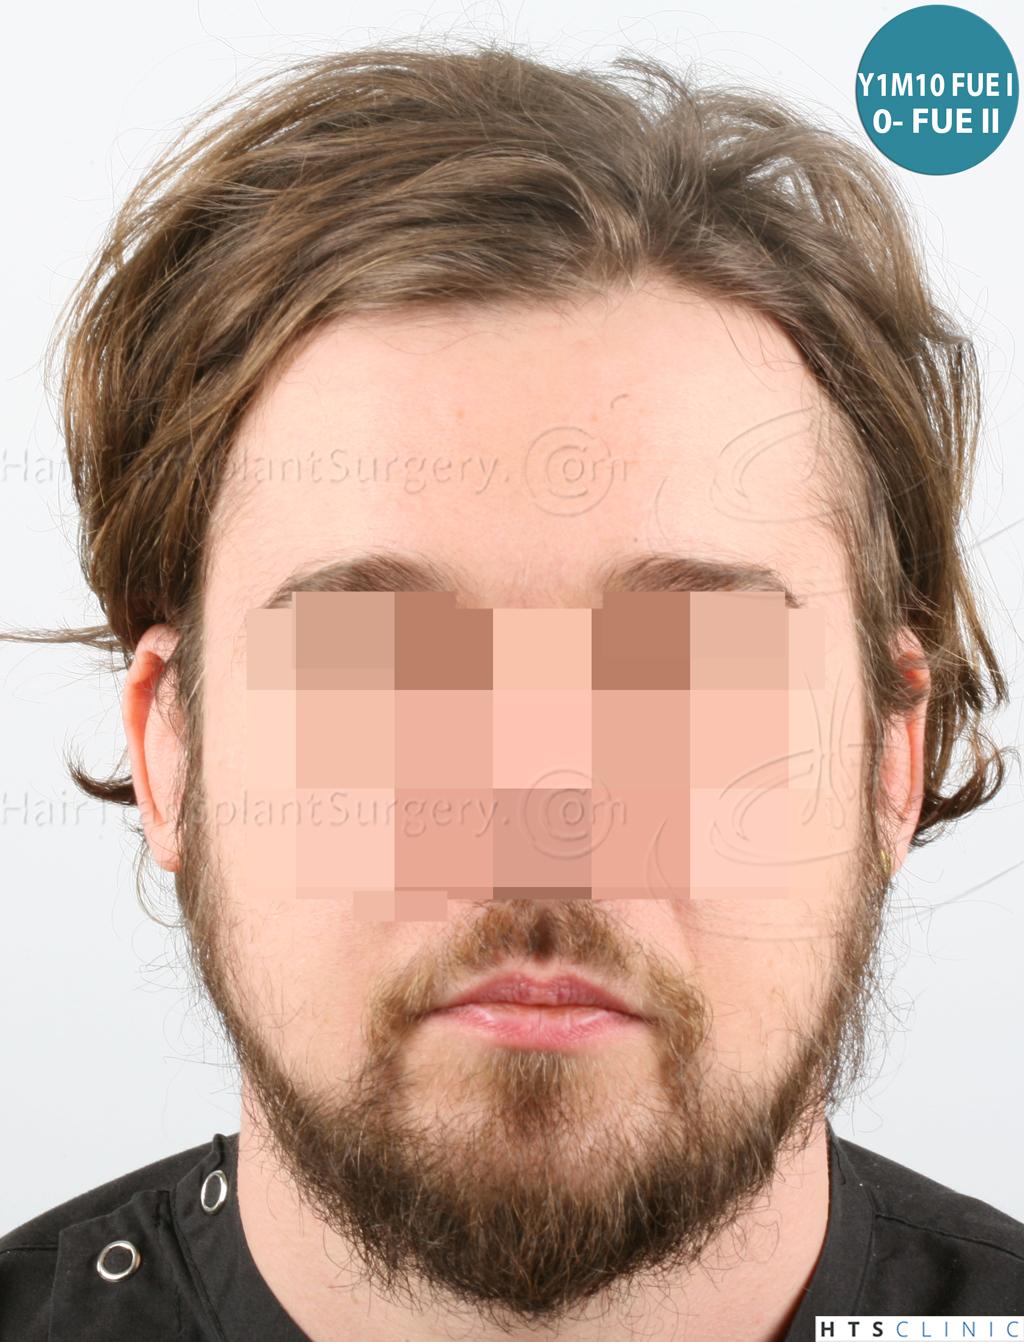 Dr.Devroye-HTS-Clinic-6132-_2011_1232_2889_-FUE-Barbe-et-cheveux-23.jpg